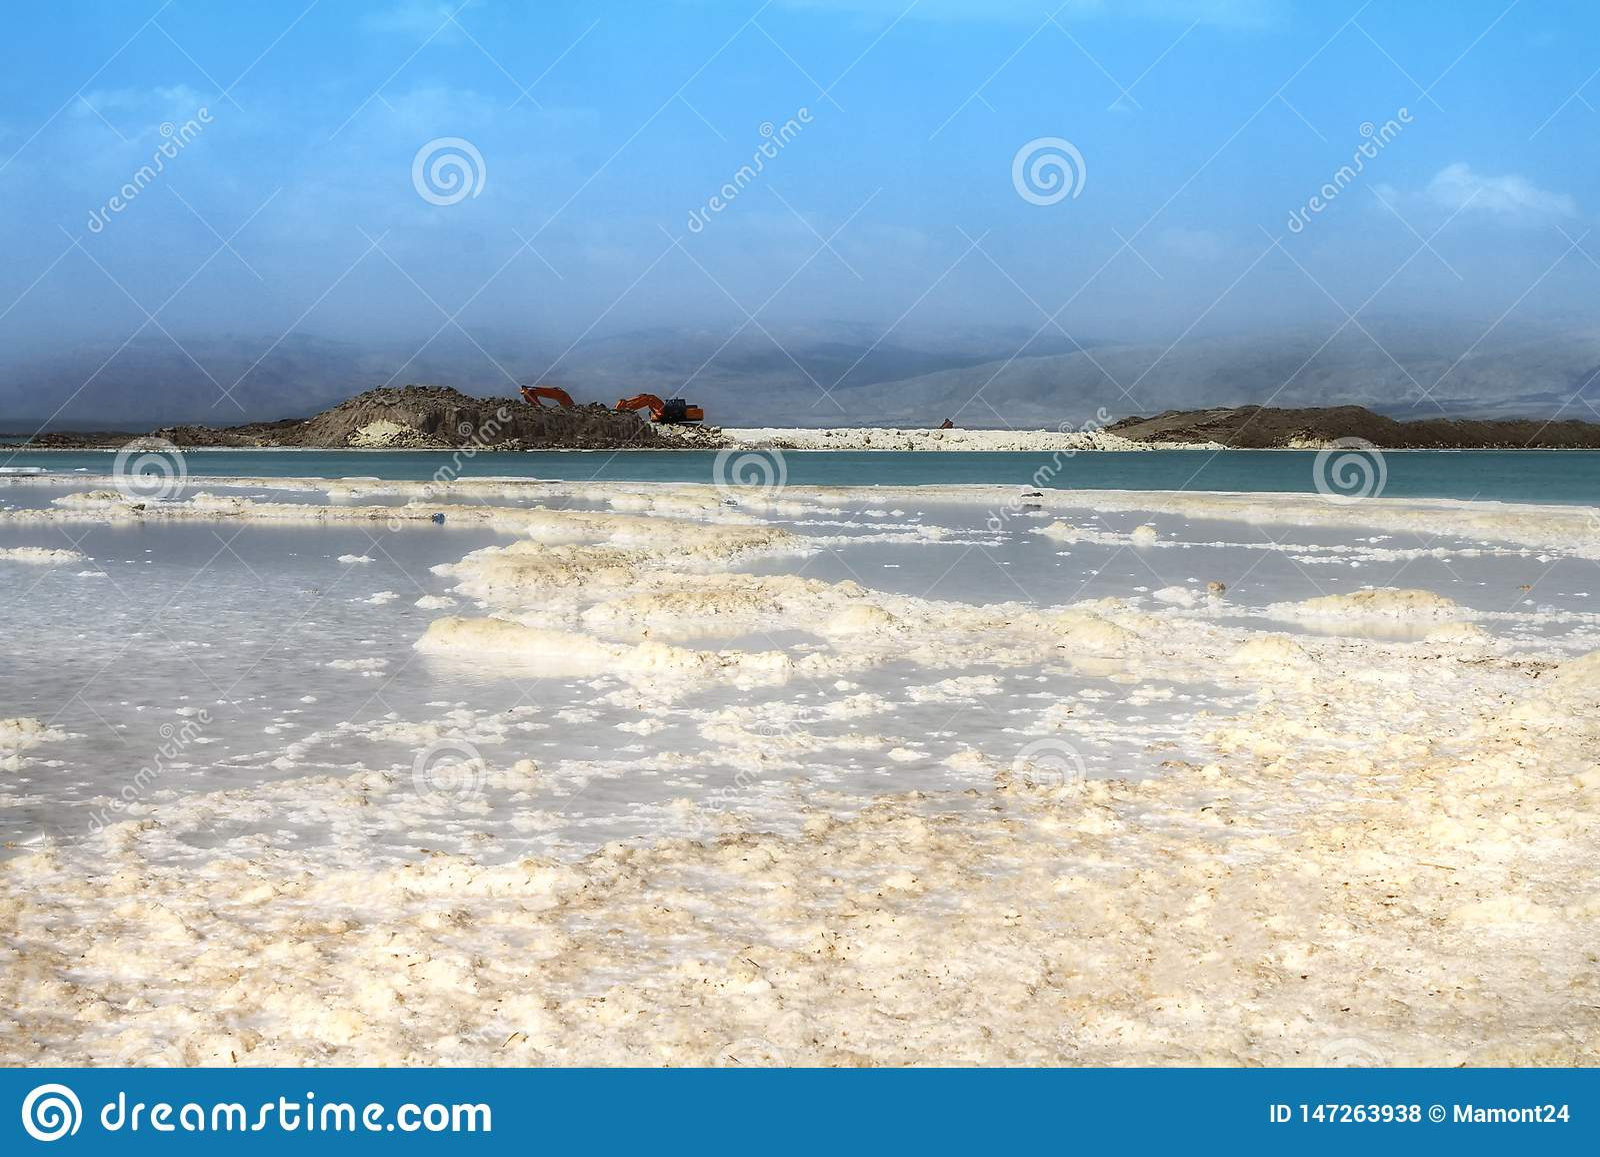 Praia de cristal do sal na costa de Mar Morto, Israel